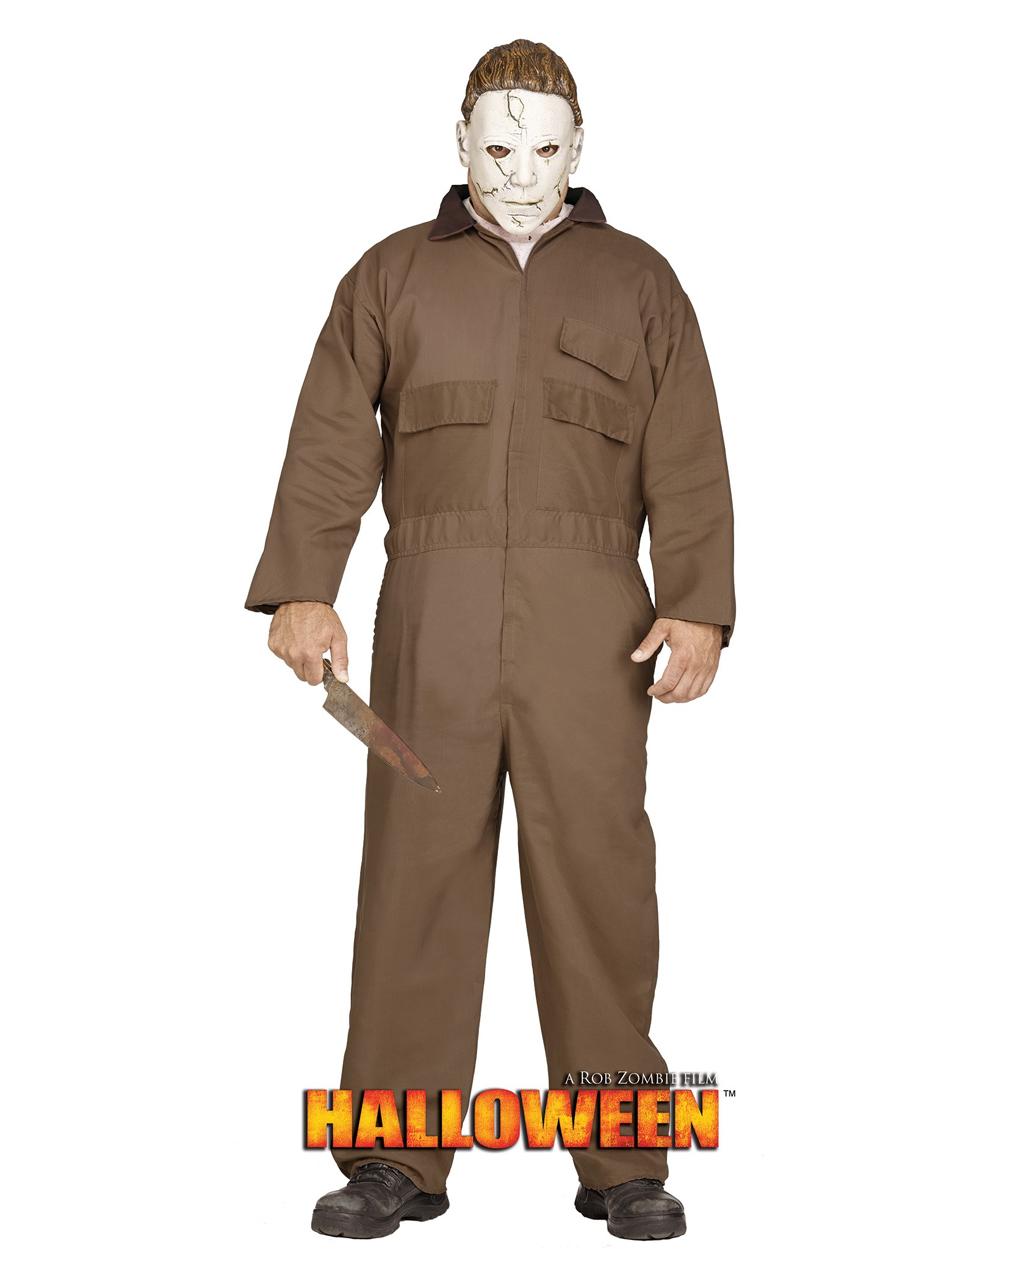 michael myers halloween costumes - the halloween